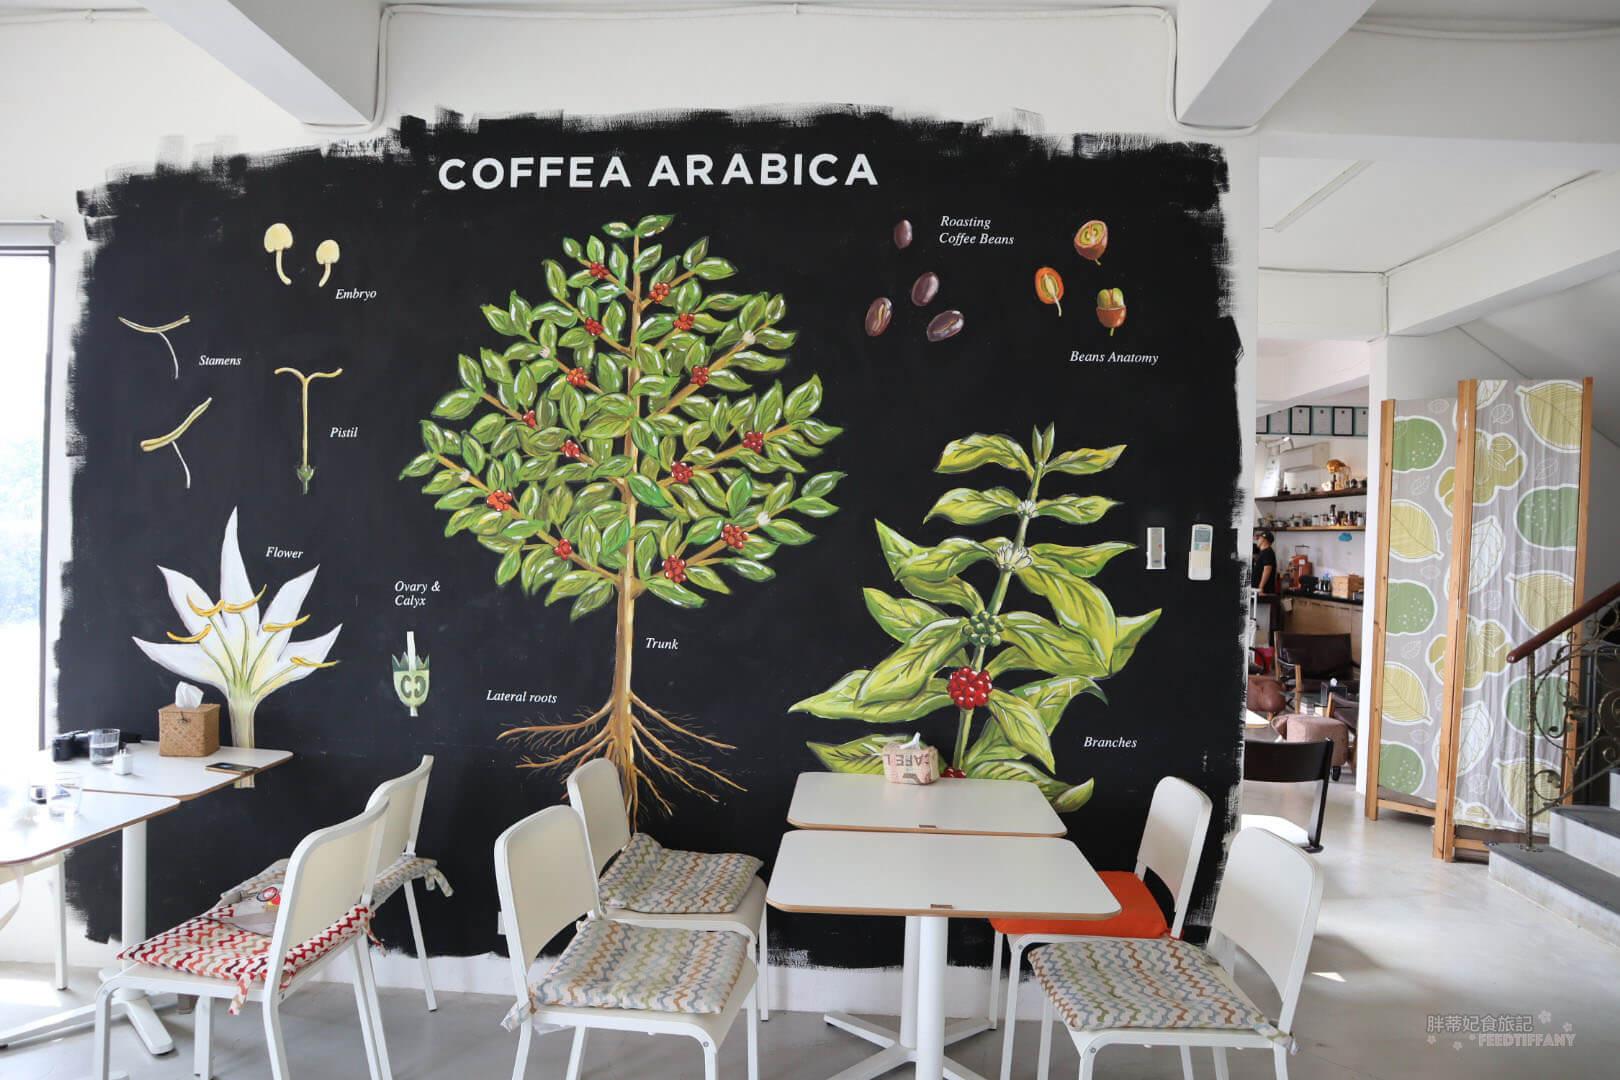 Twi A錘子咖啡烘焙坊 有一個牆面上有著咖啡樹的成長過程。讓人更能了解咖啡豆怎麼來的